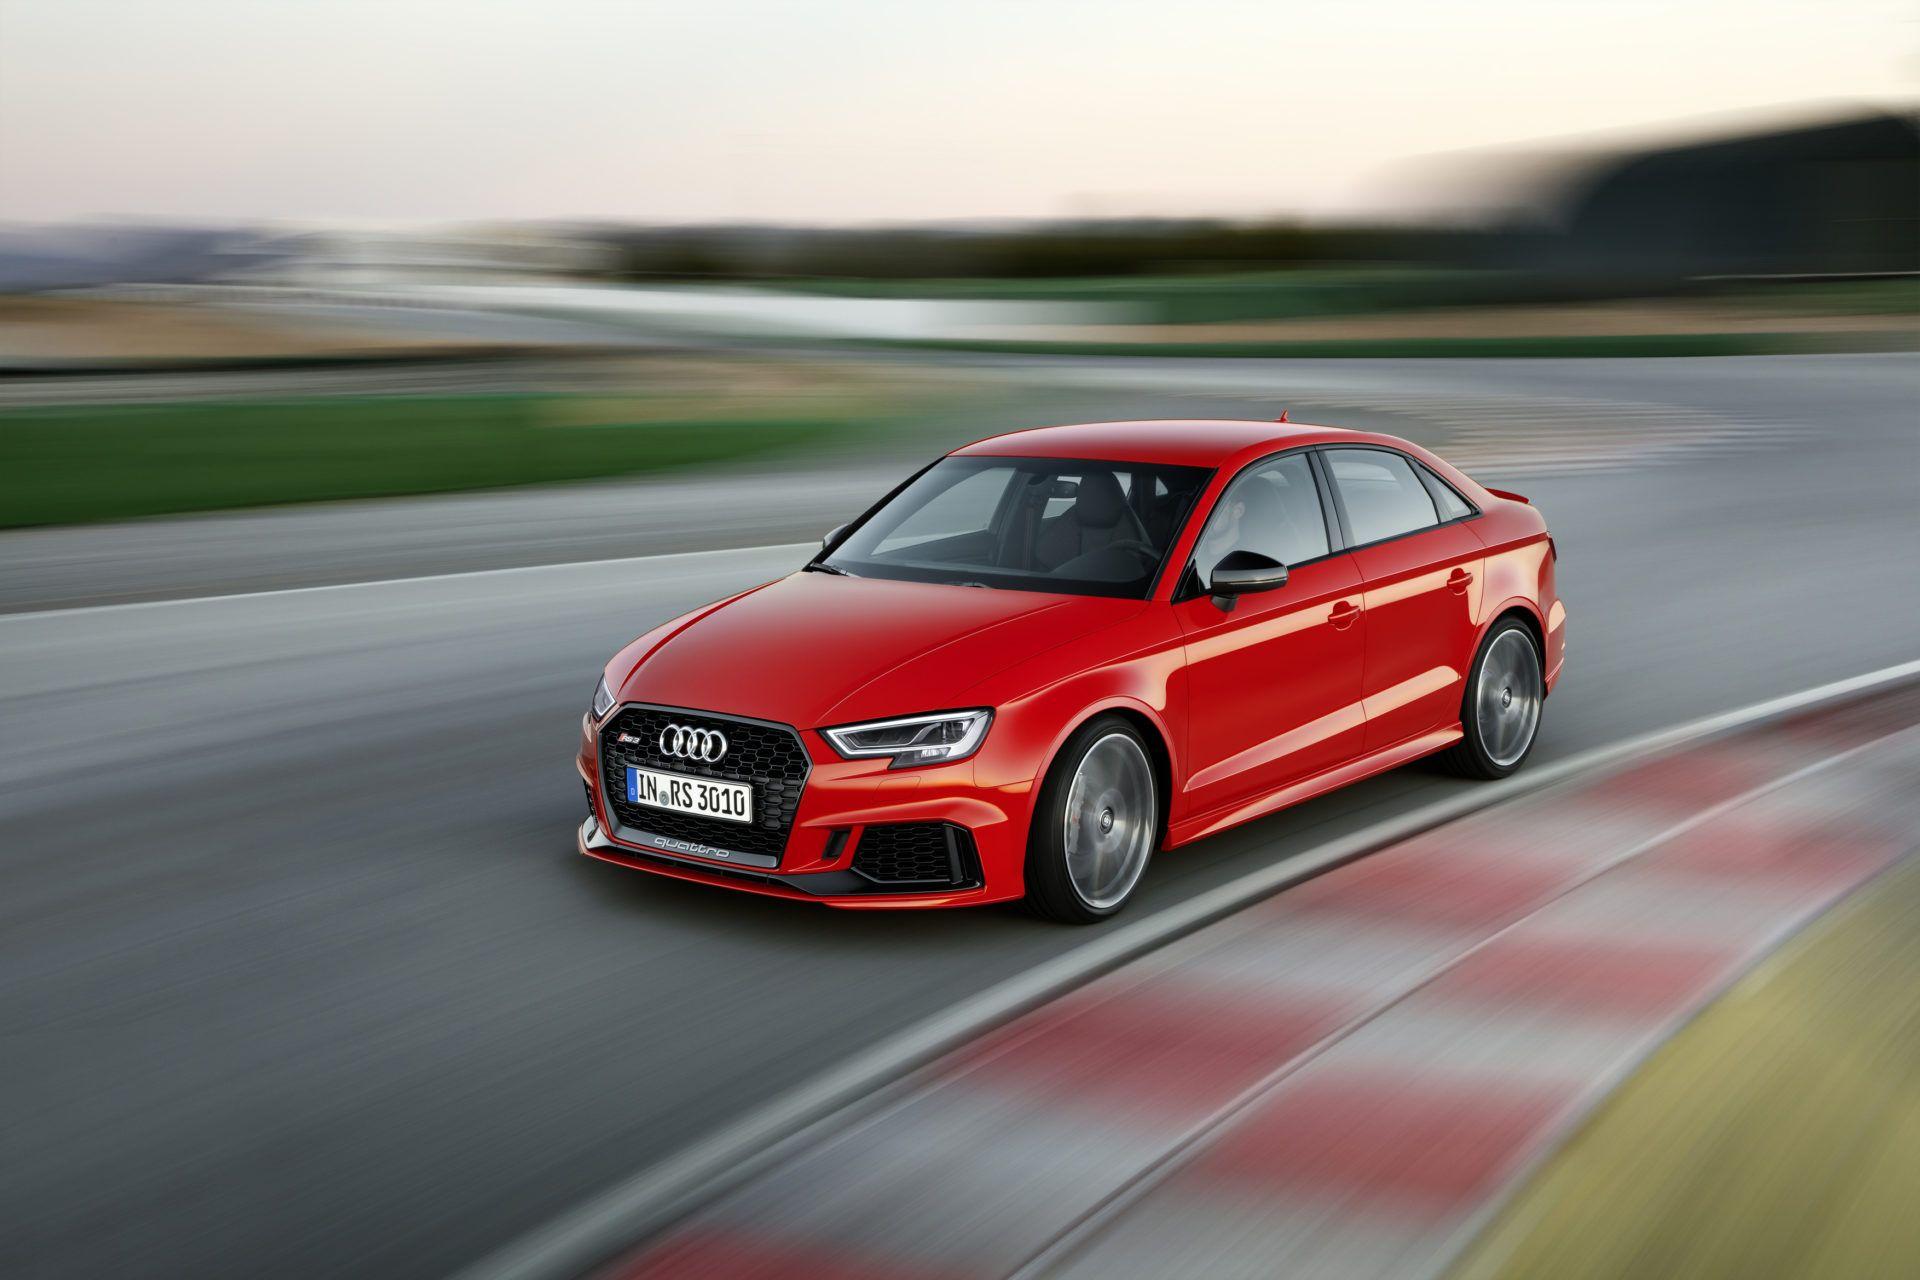 Audi RS Sedan Makes Car And Drivers Best List Httpwww - Audi sports car list